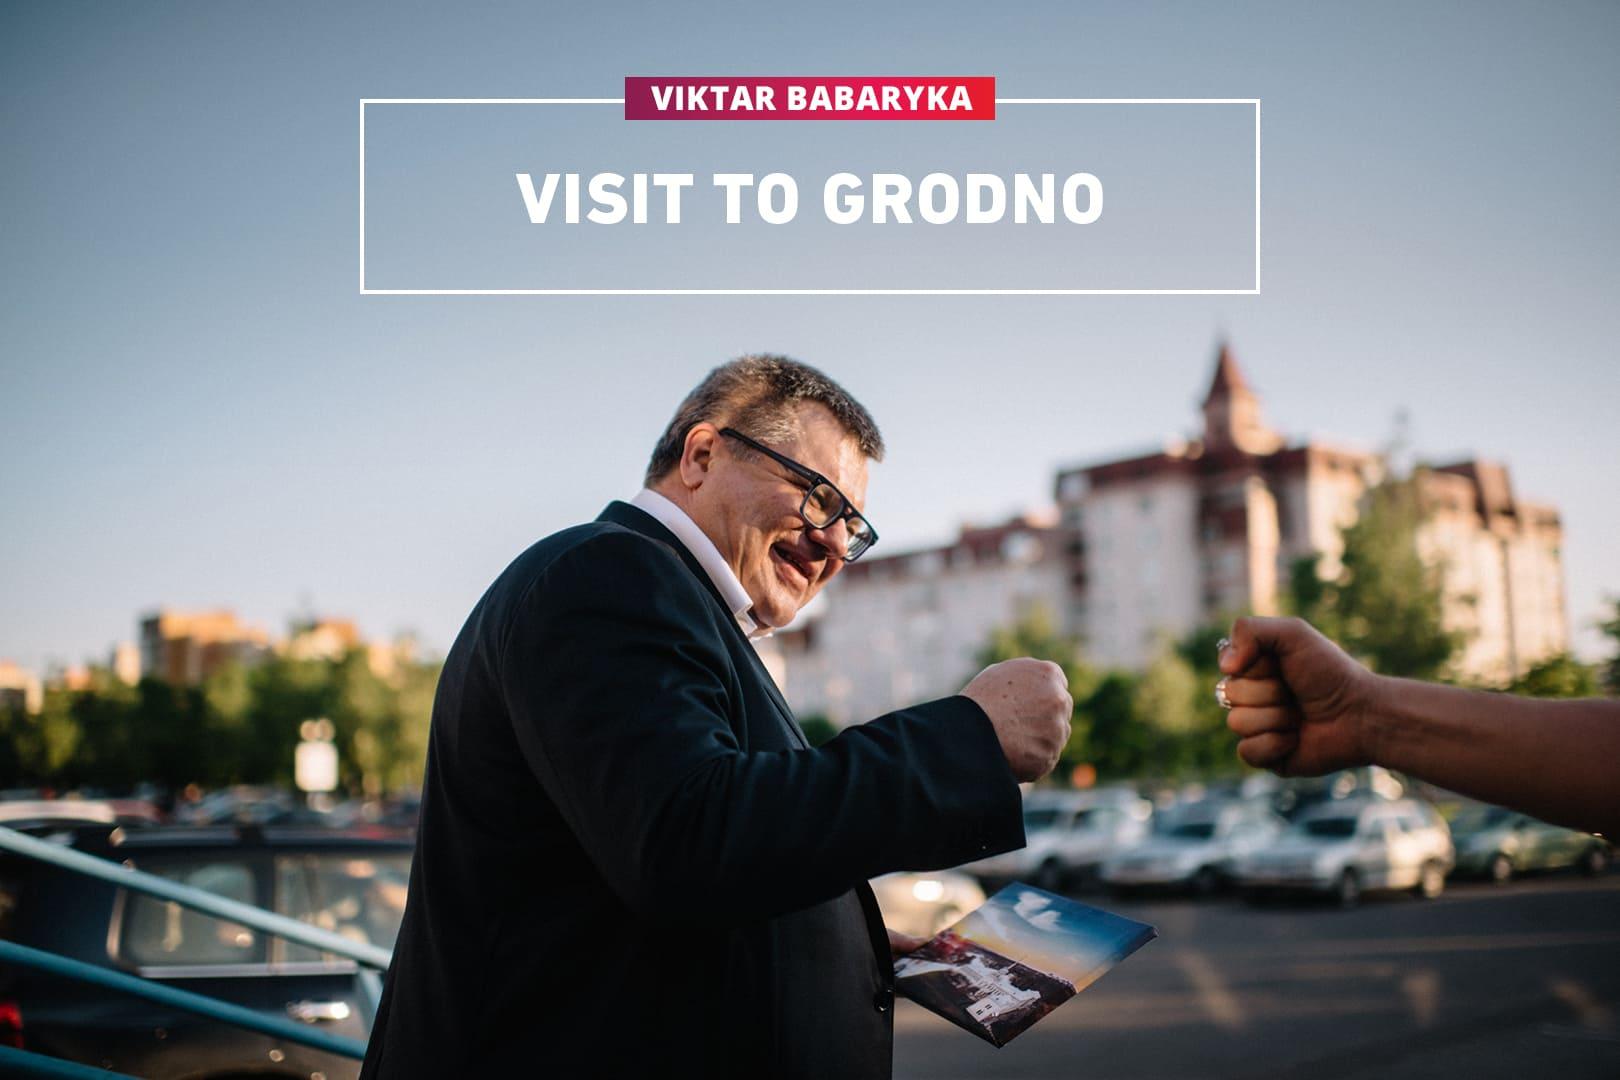 Viktar Babaryka Visit to Grodno